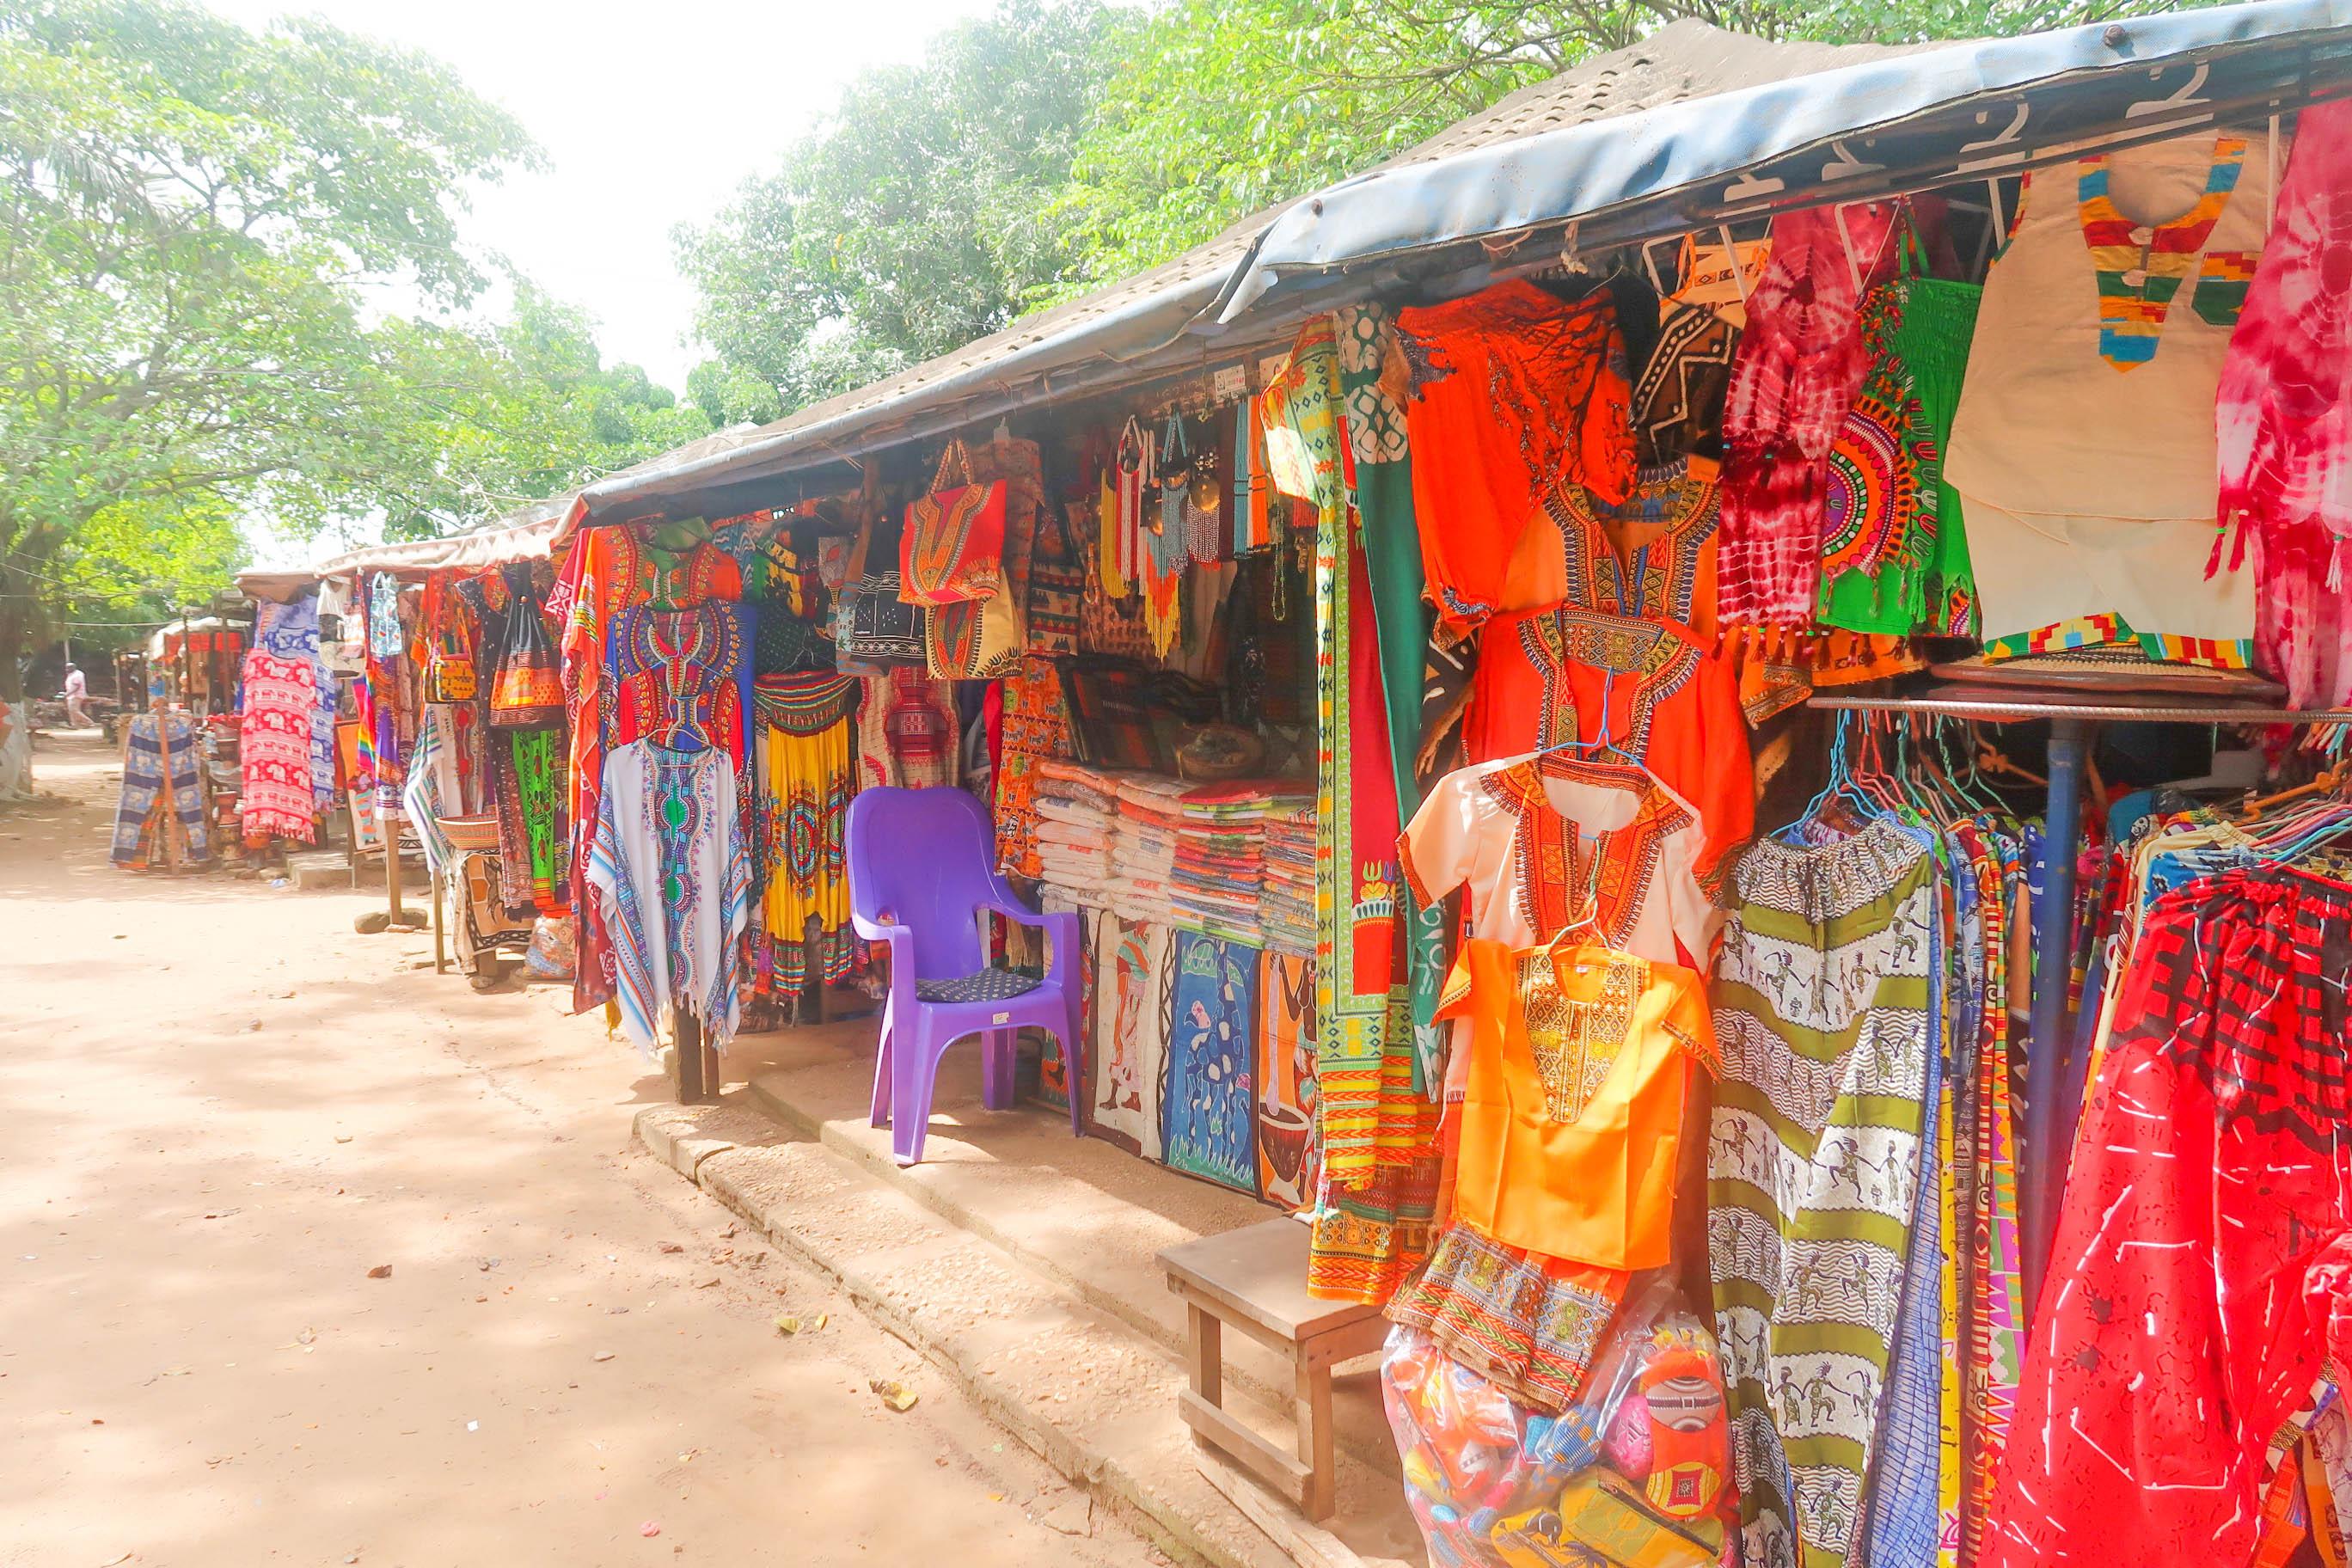 African Crafts Market - Abidjan